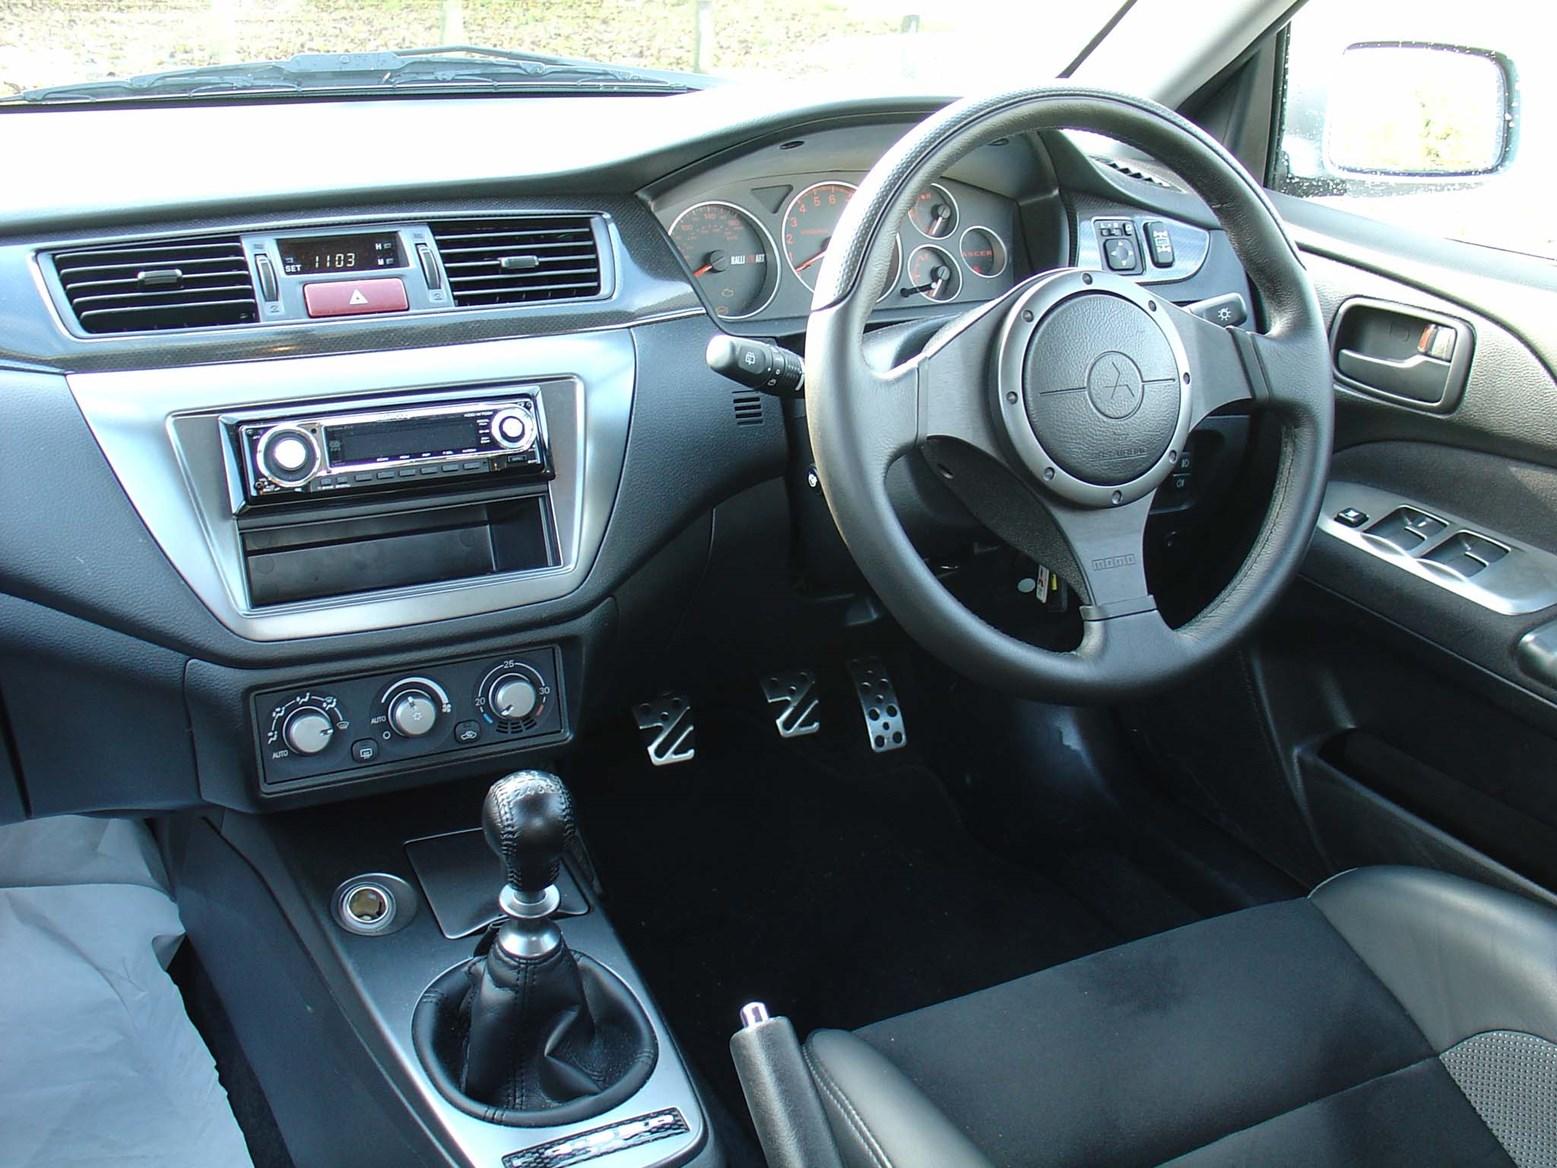 Mitsubishi Lancer Evo Evo Ix 2005 2008 Features Equipment And Accessories Parkers